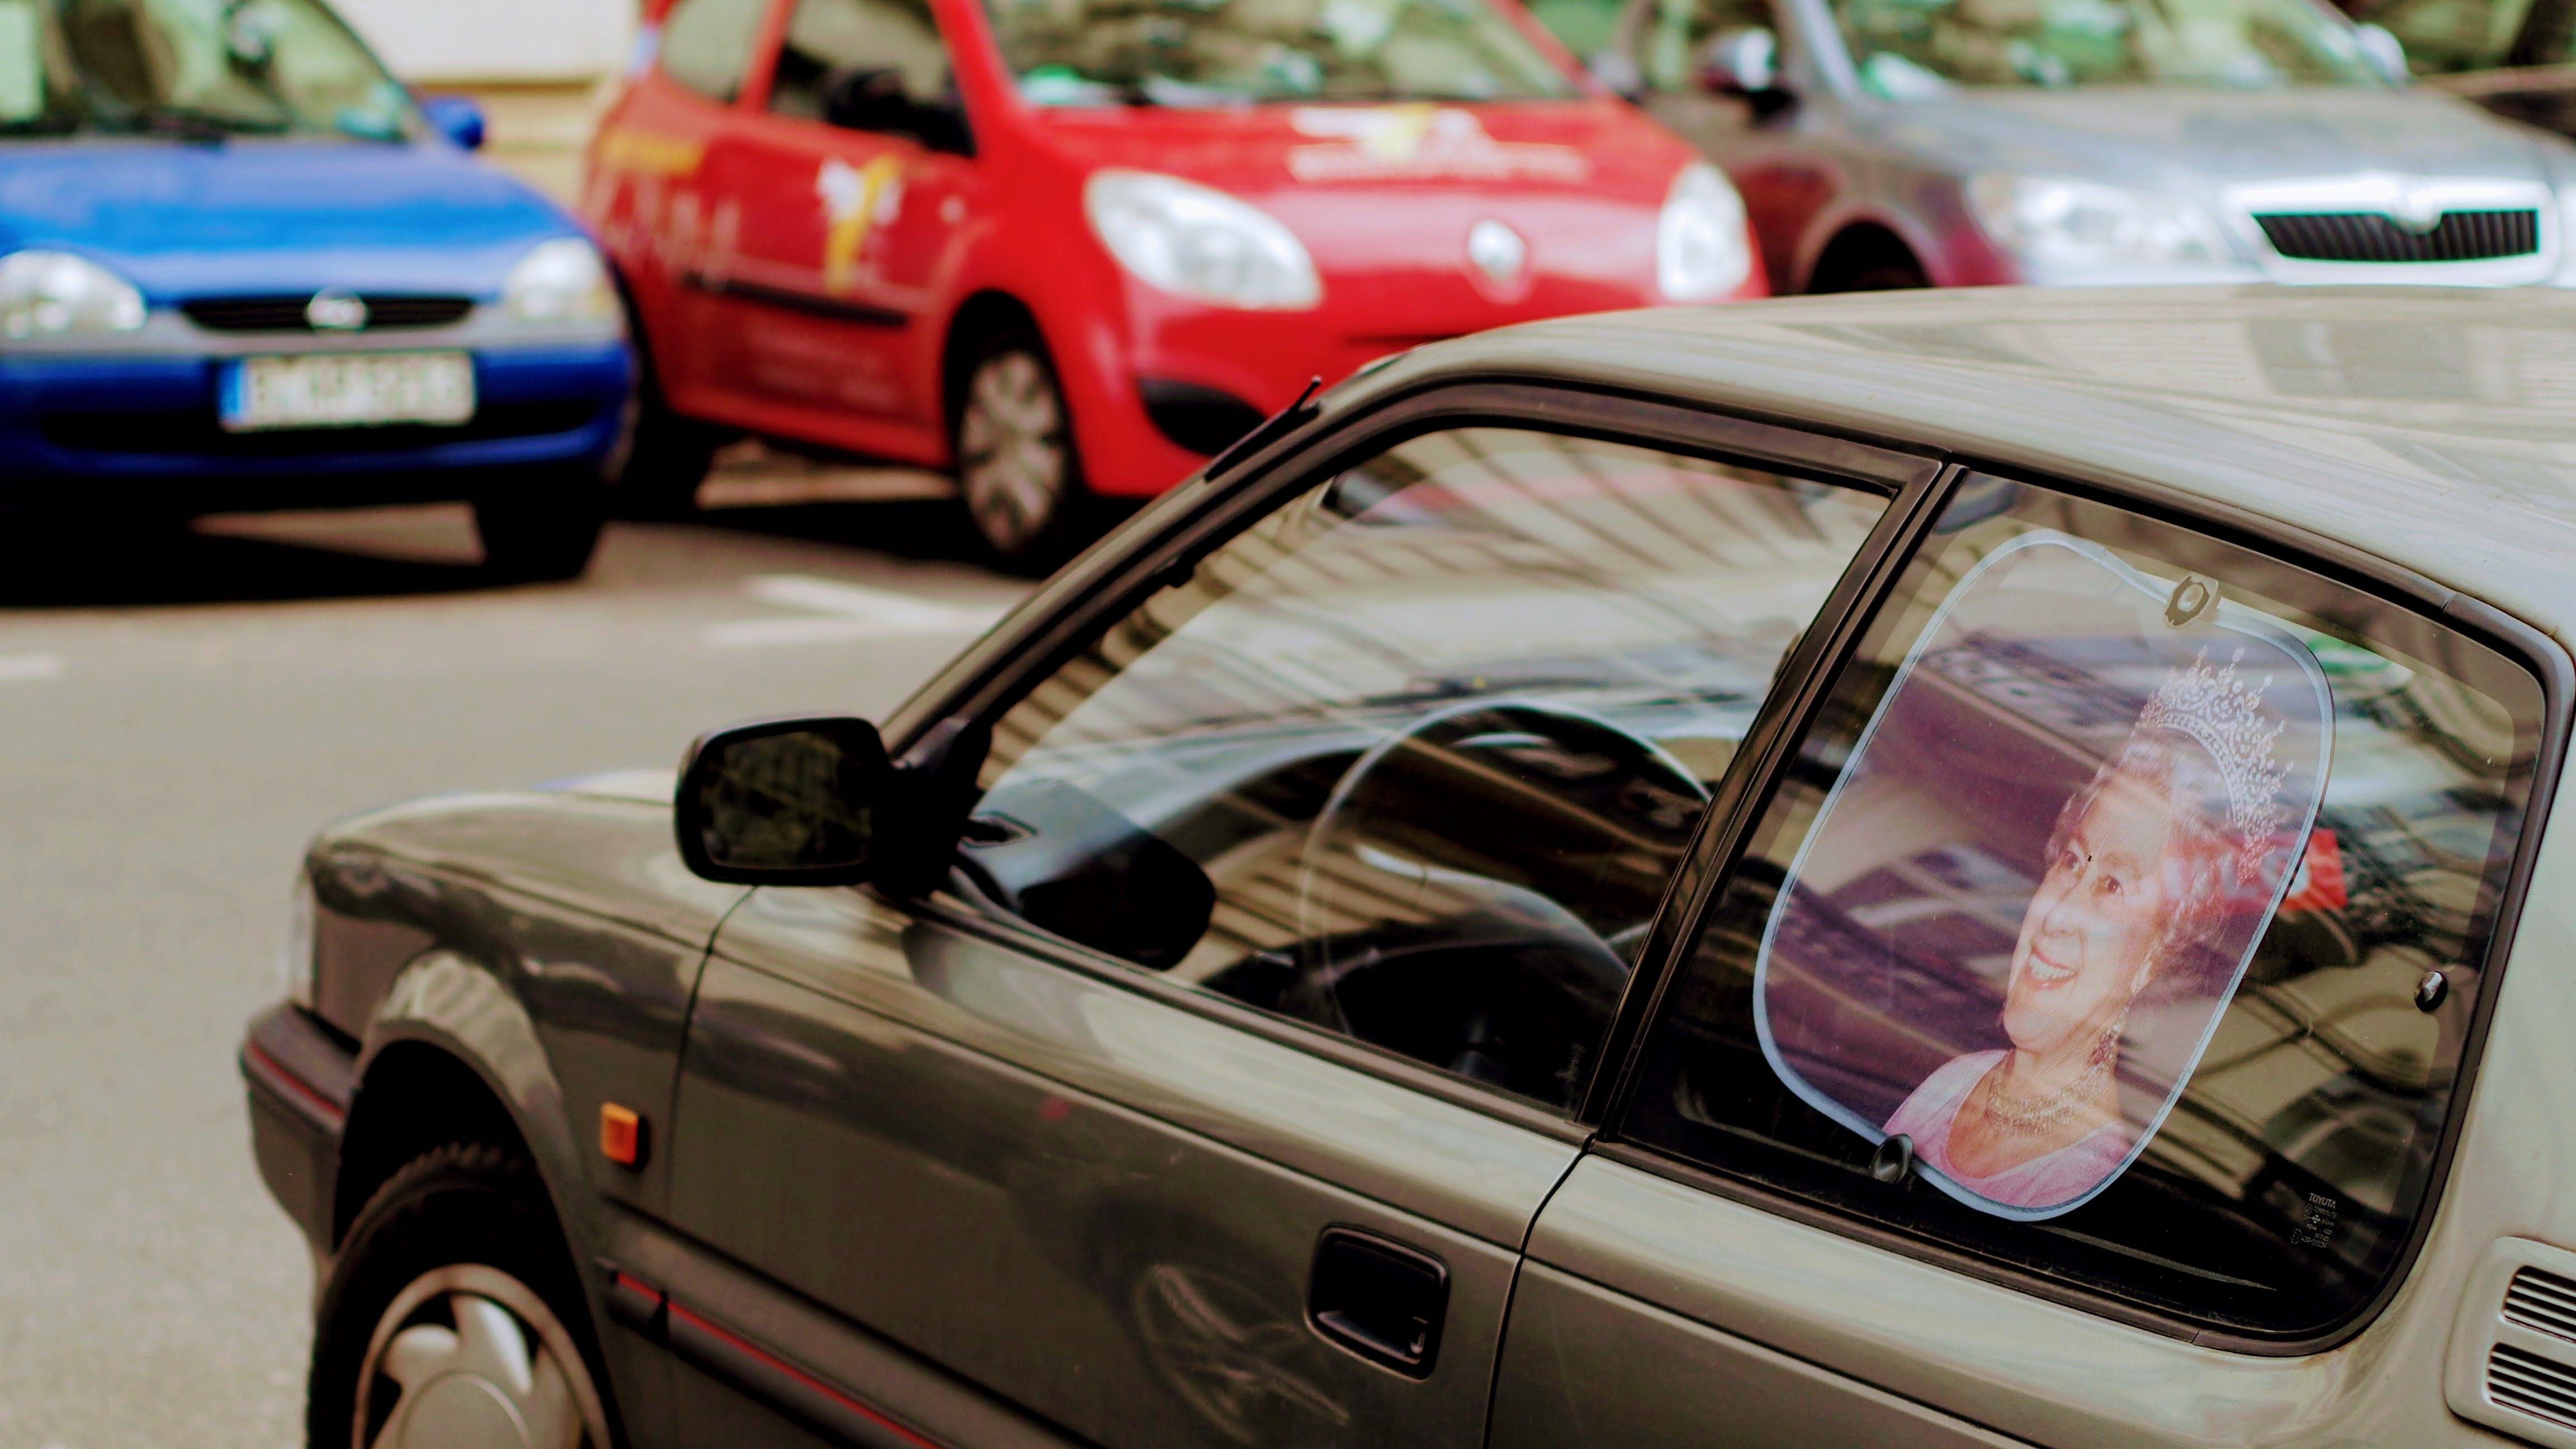 Gray Car With Queen Elizabeth Photo Window Visor Poster